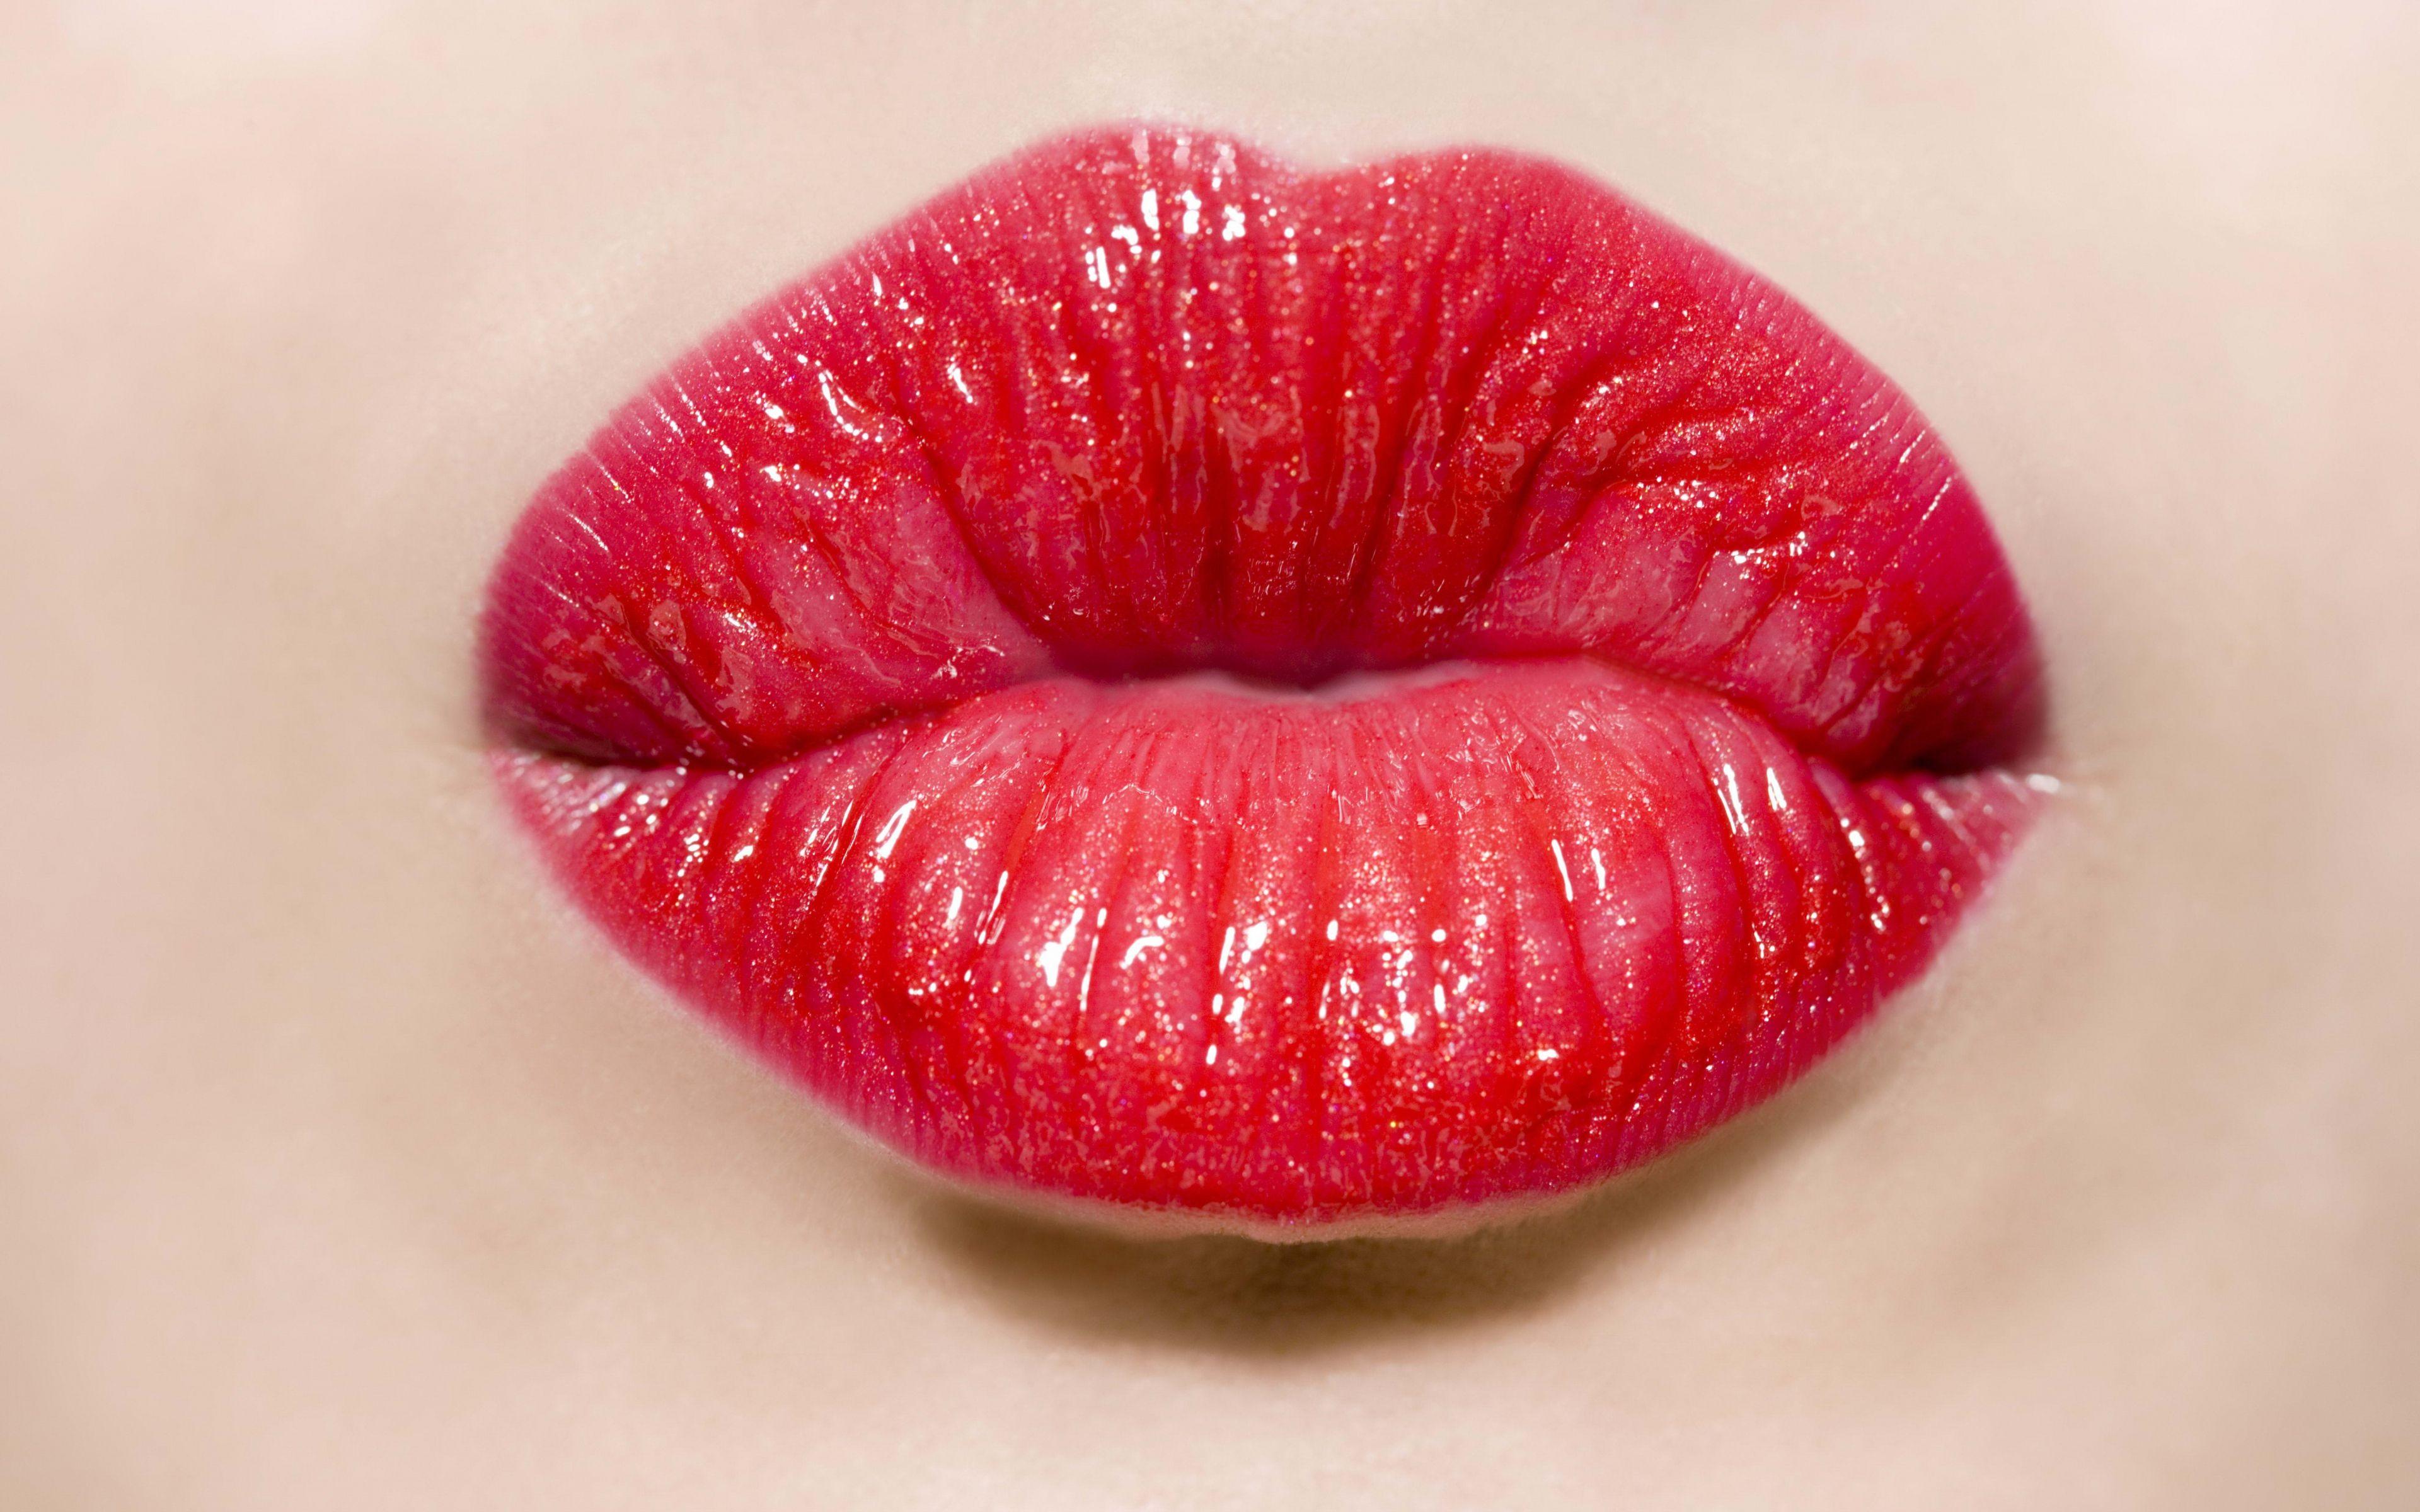 lips_kiss_girl_lipstick_close-up_77230_3840x2400